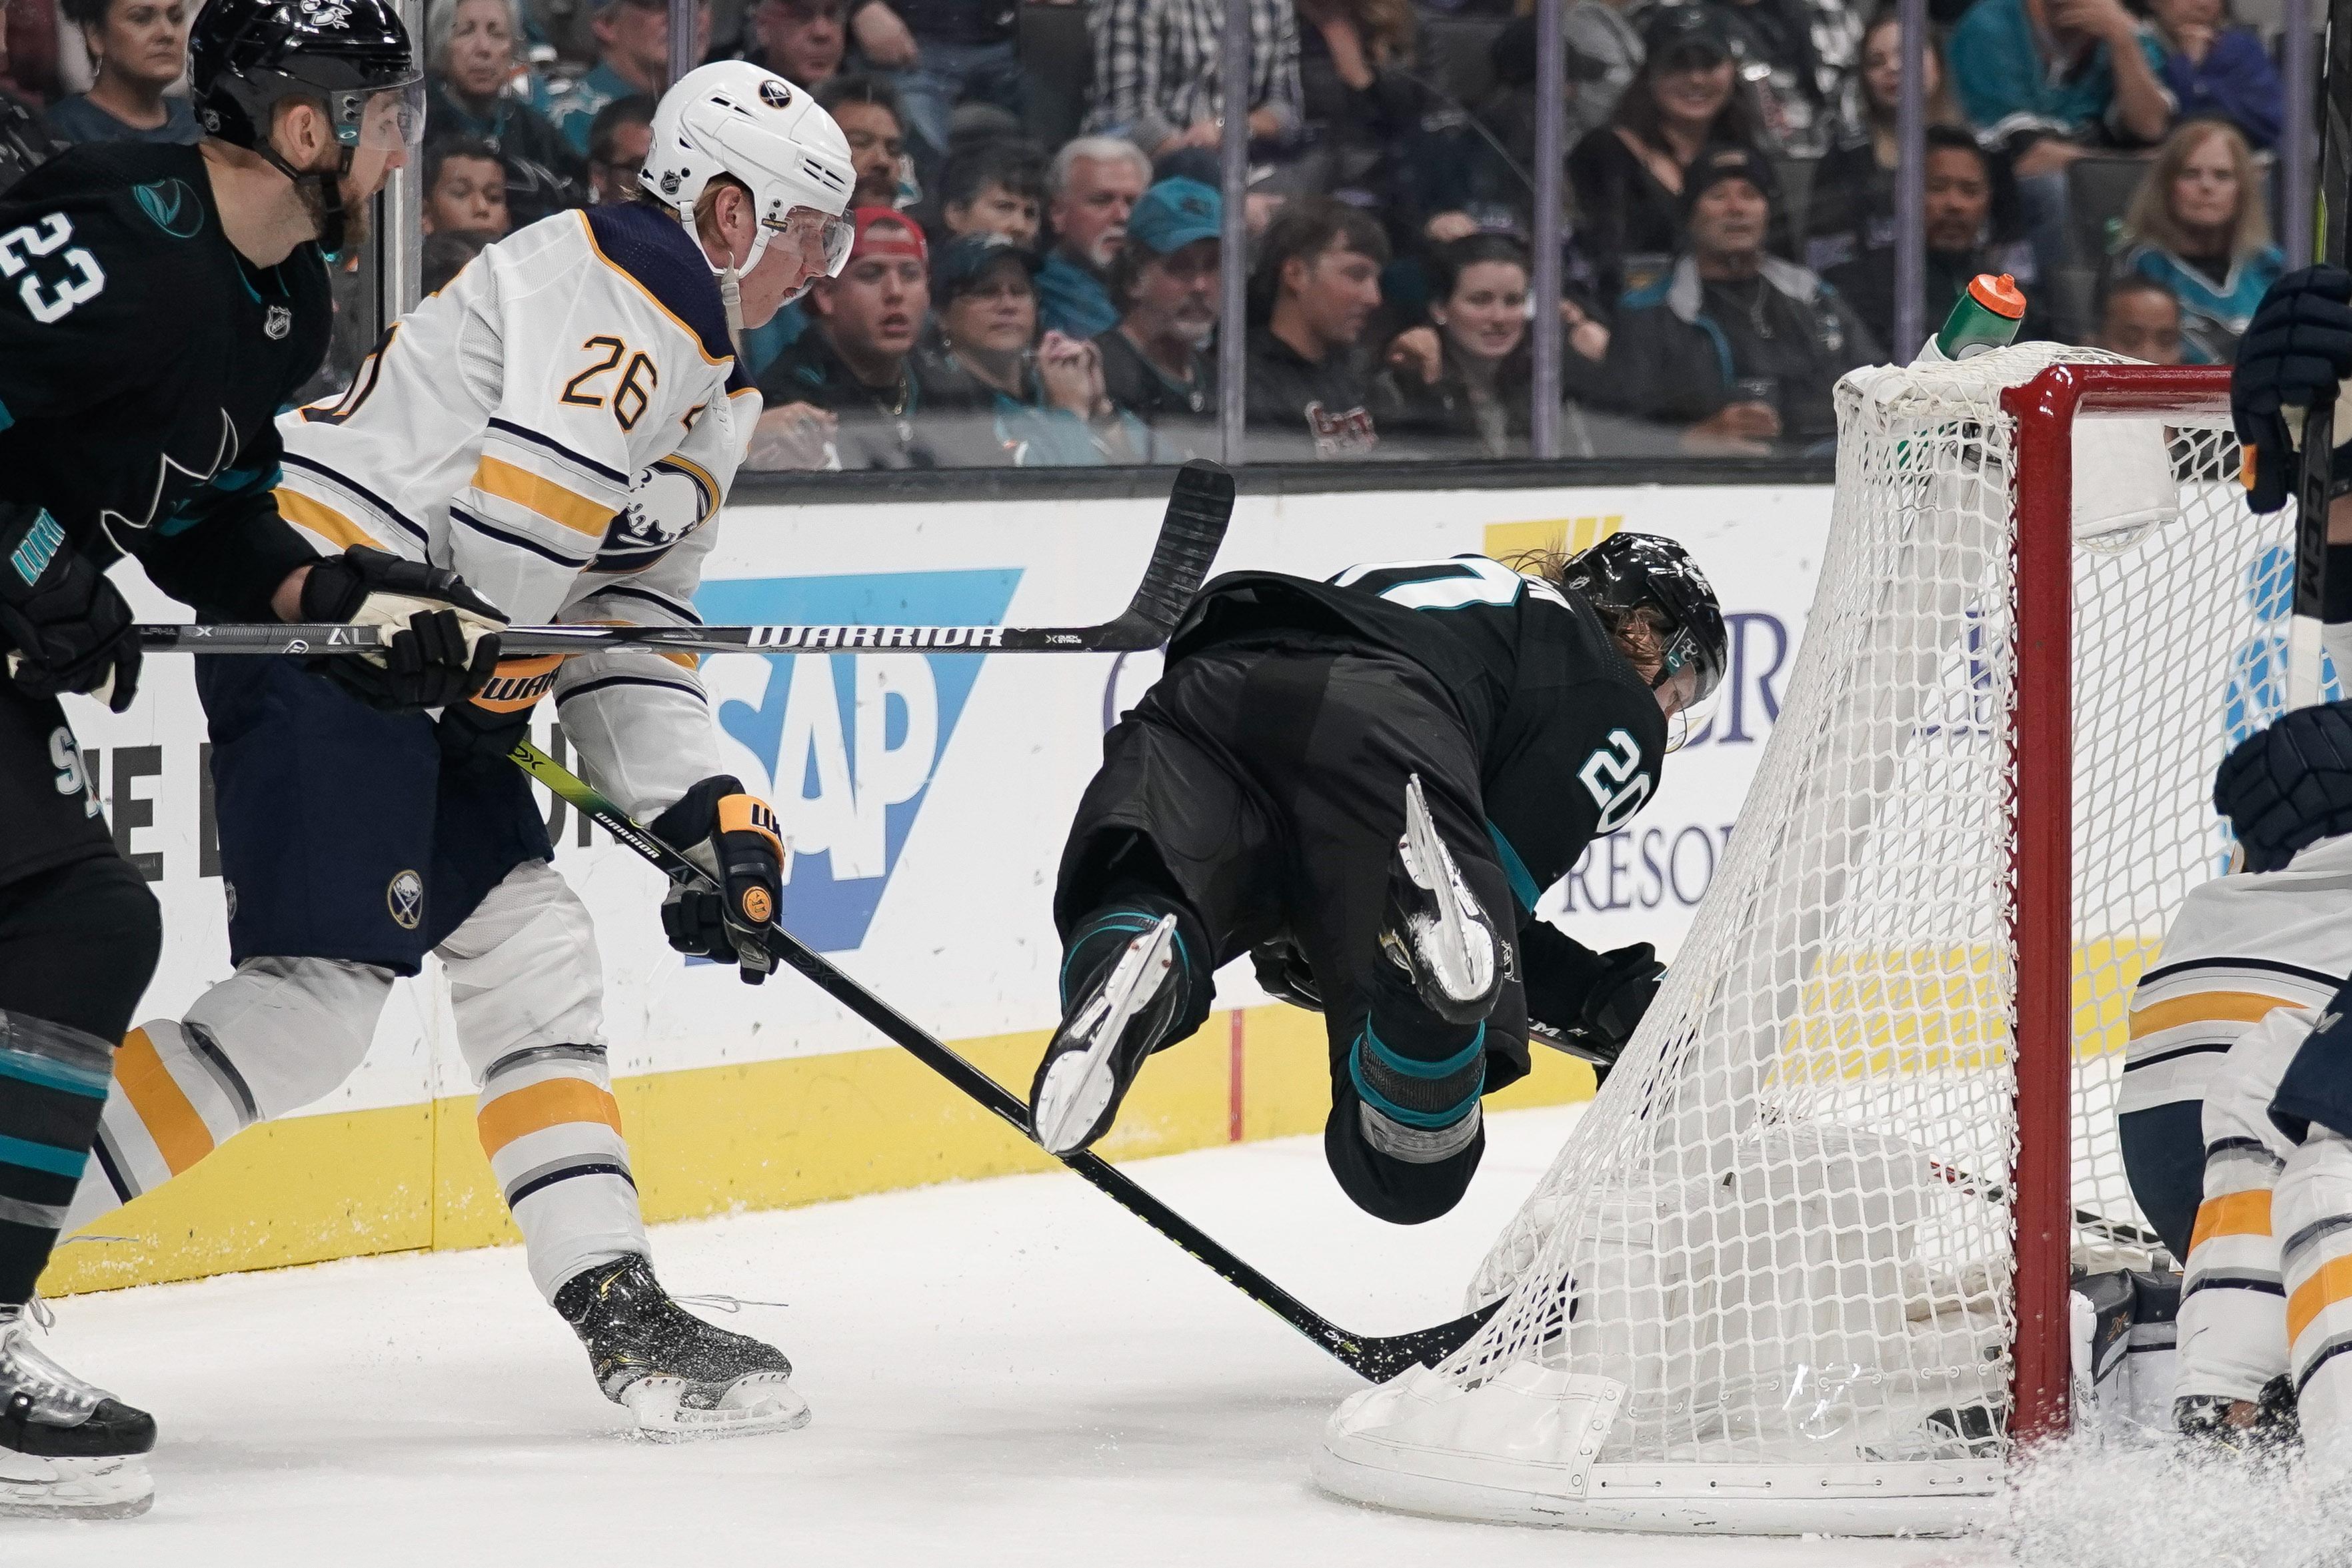 Oct 19, 2019; San Jose, CA, USA; Buffalo Sabres defenseman Rasmus Dahlin (26) trips San Jose Sharks left wing Marcus Sorensen (20) during the second period at SAP Center at San Jose.